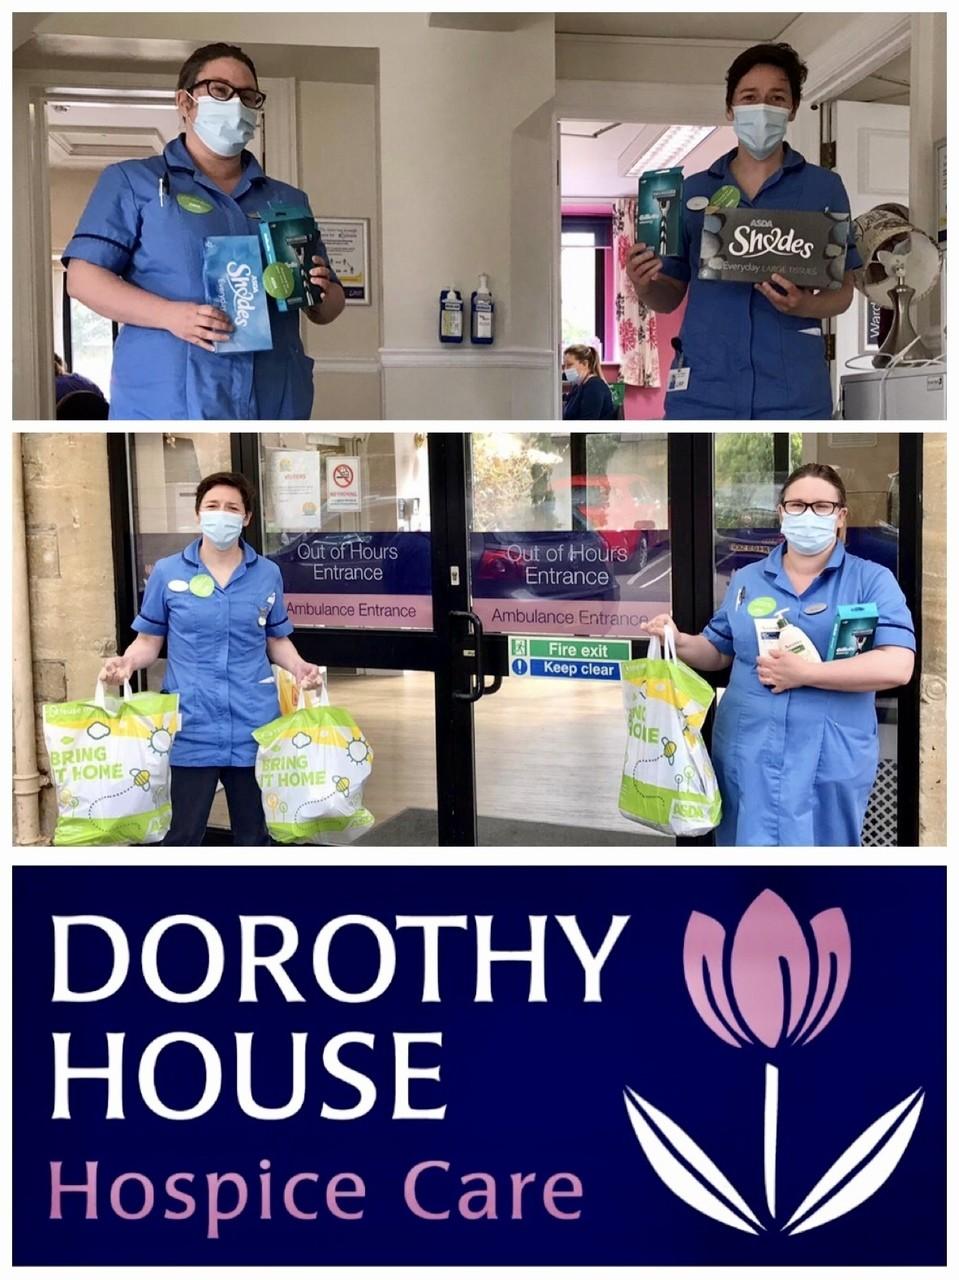 Dorothy House Hospice | Asda Frome